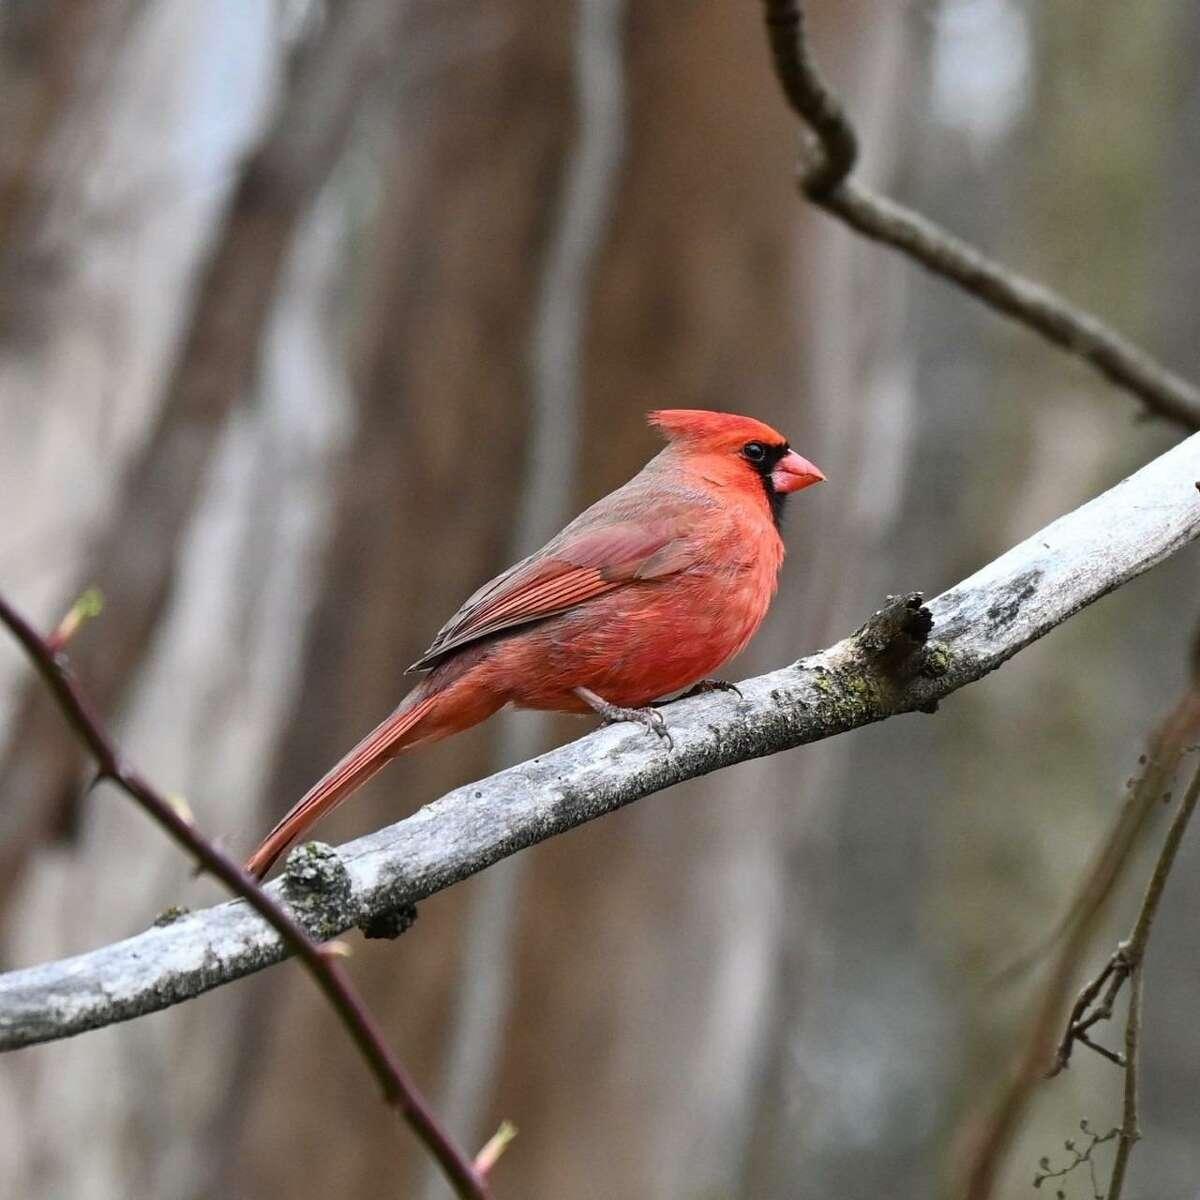 Sam Nunes, an environmental educator at the Woodcock Nature Center in Wilton, Conn. writes this regular column titled: